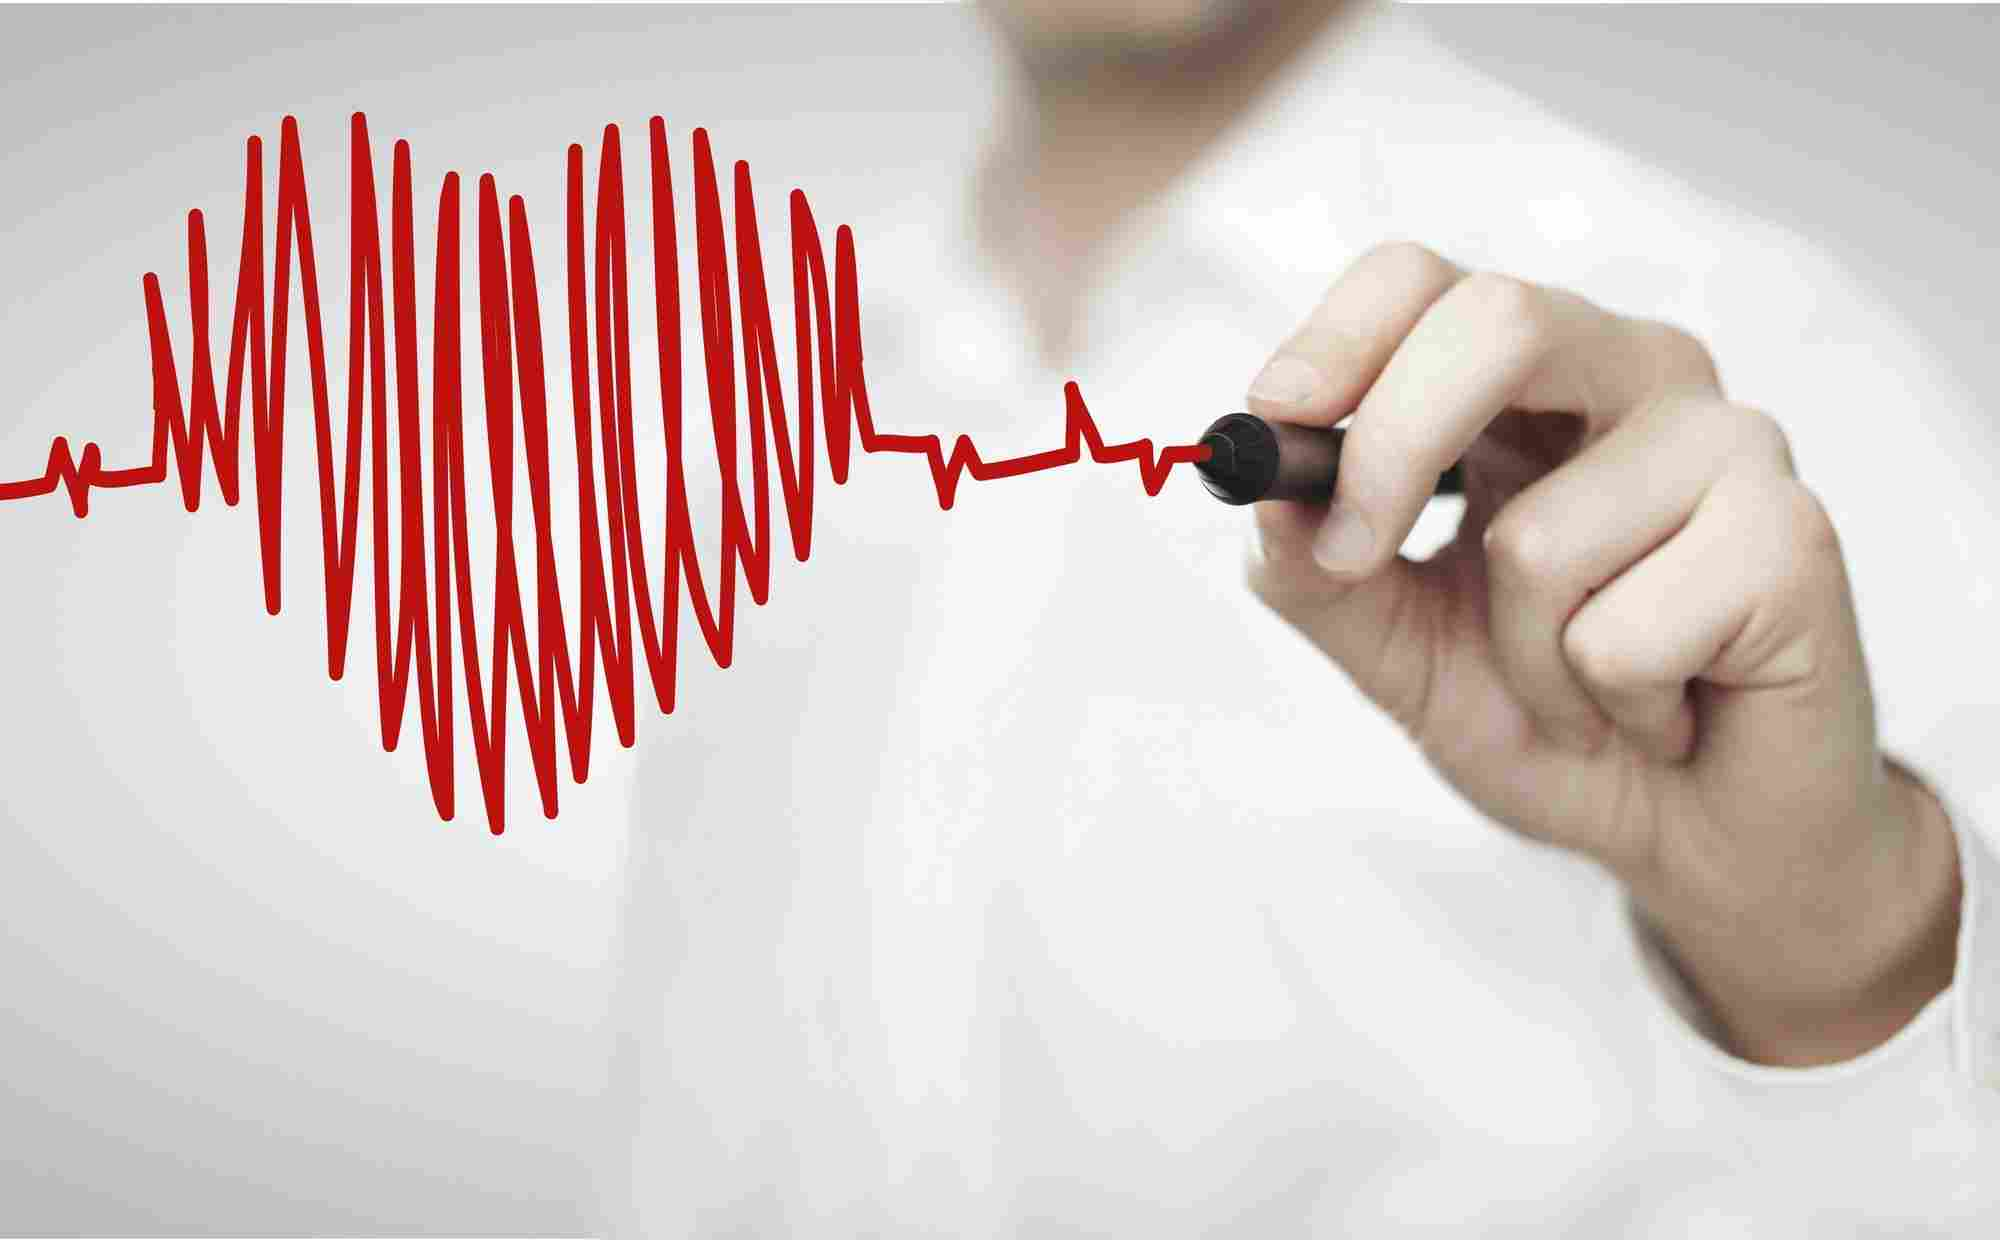 https://medquimheo.com.br/wp-content/uploads/2015/12/heart-health-1.jpg